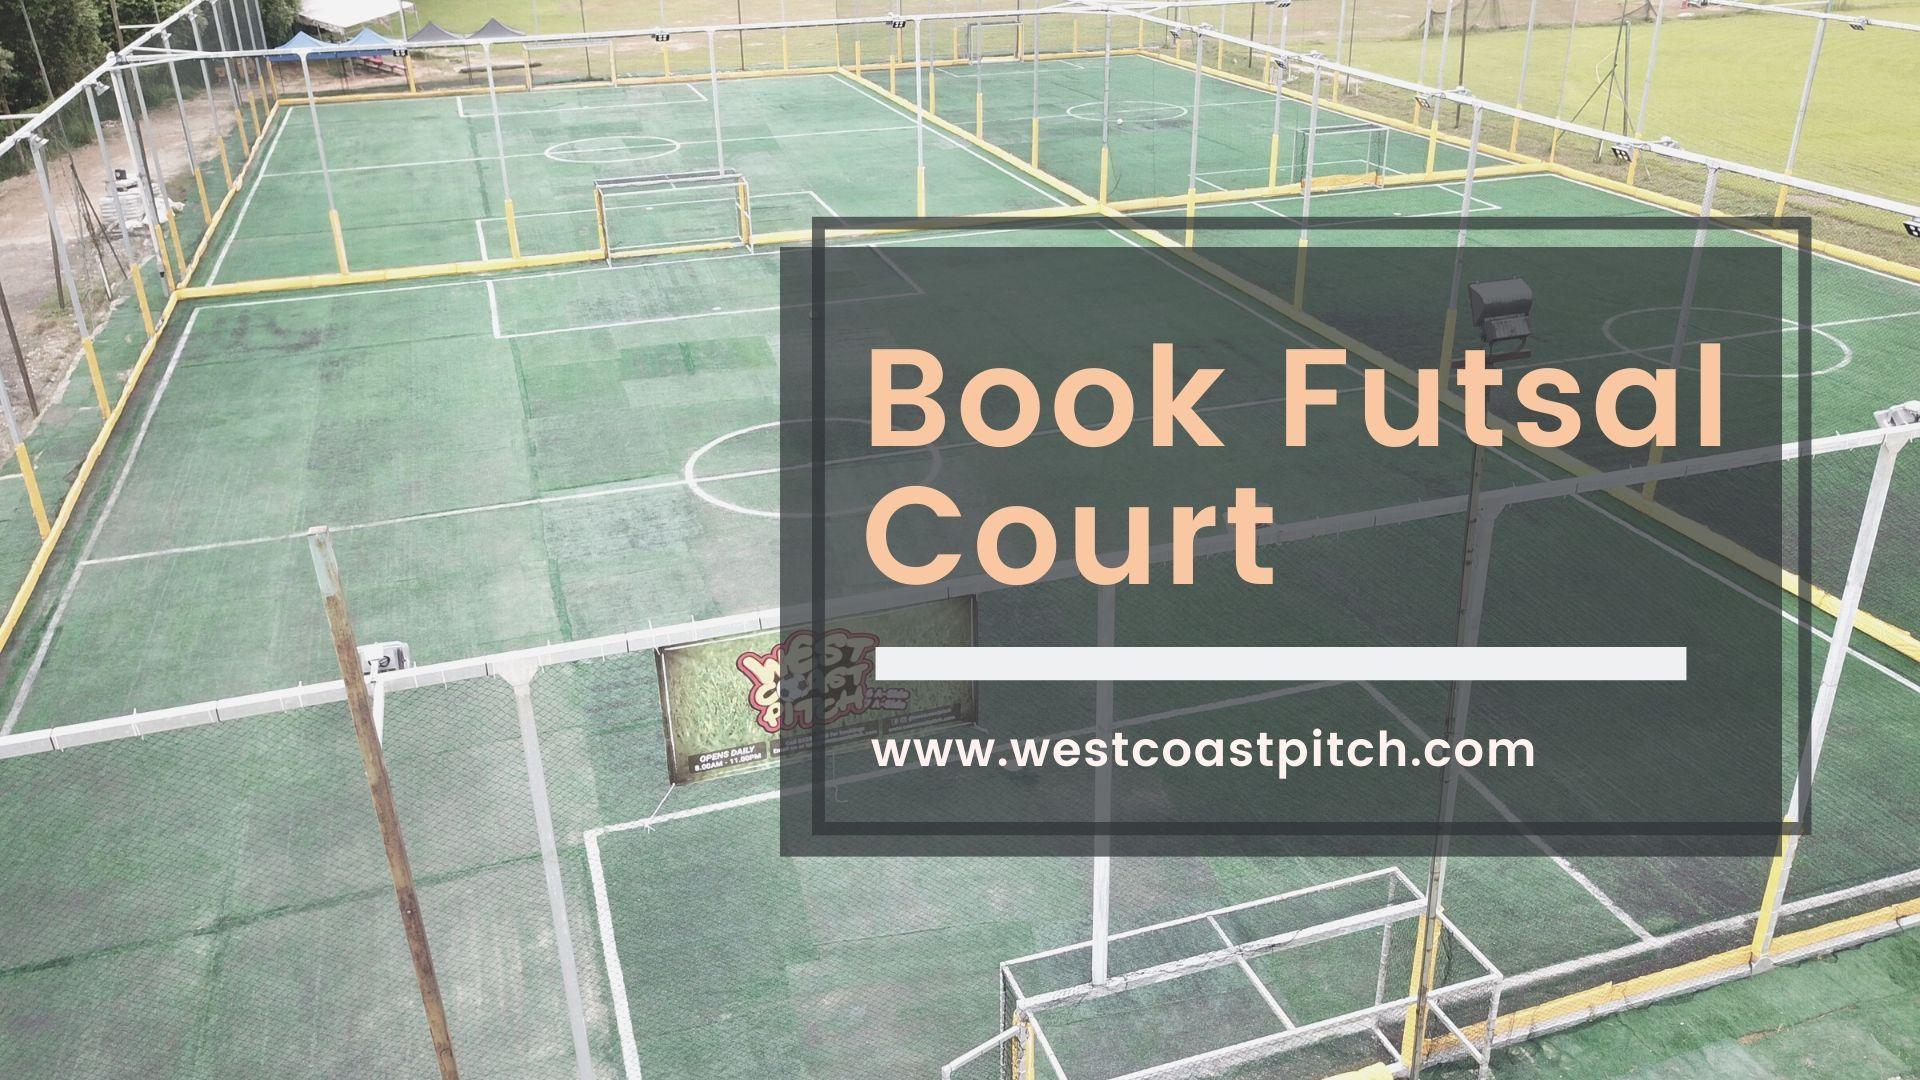 Futsal a famous sport in the globe in such a short